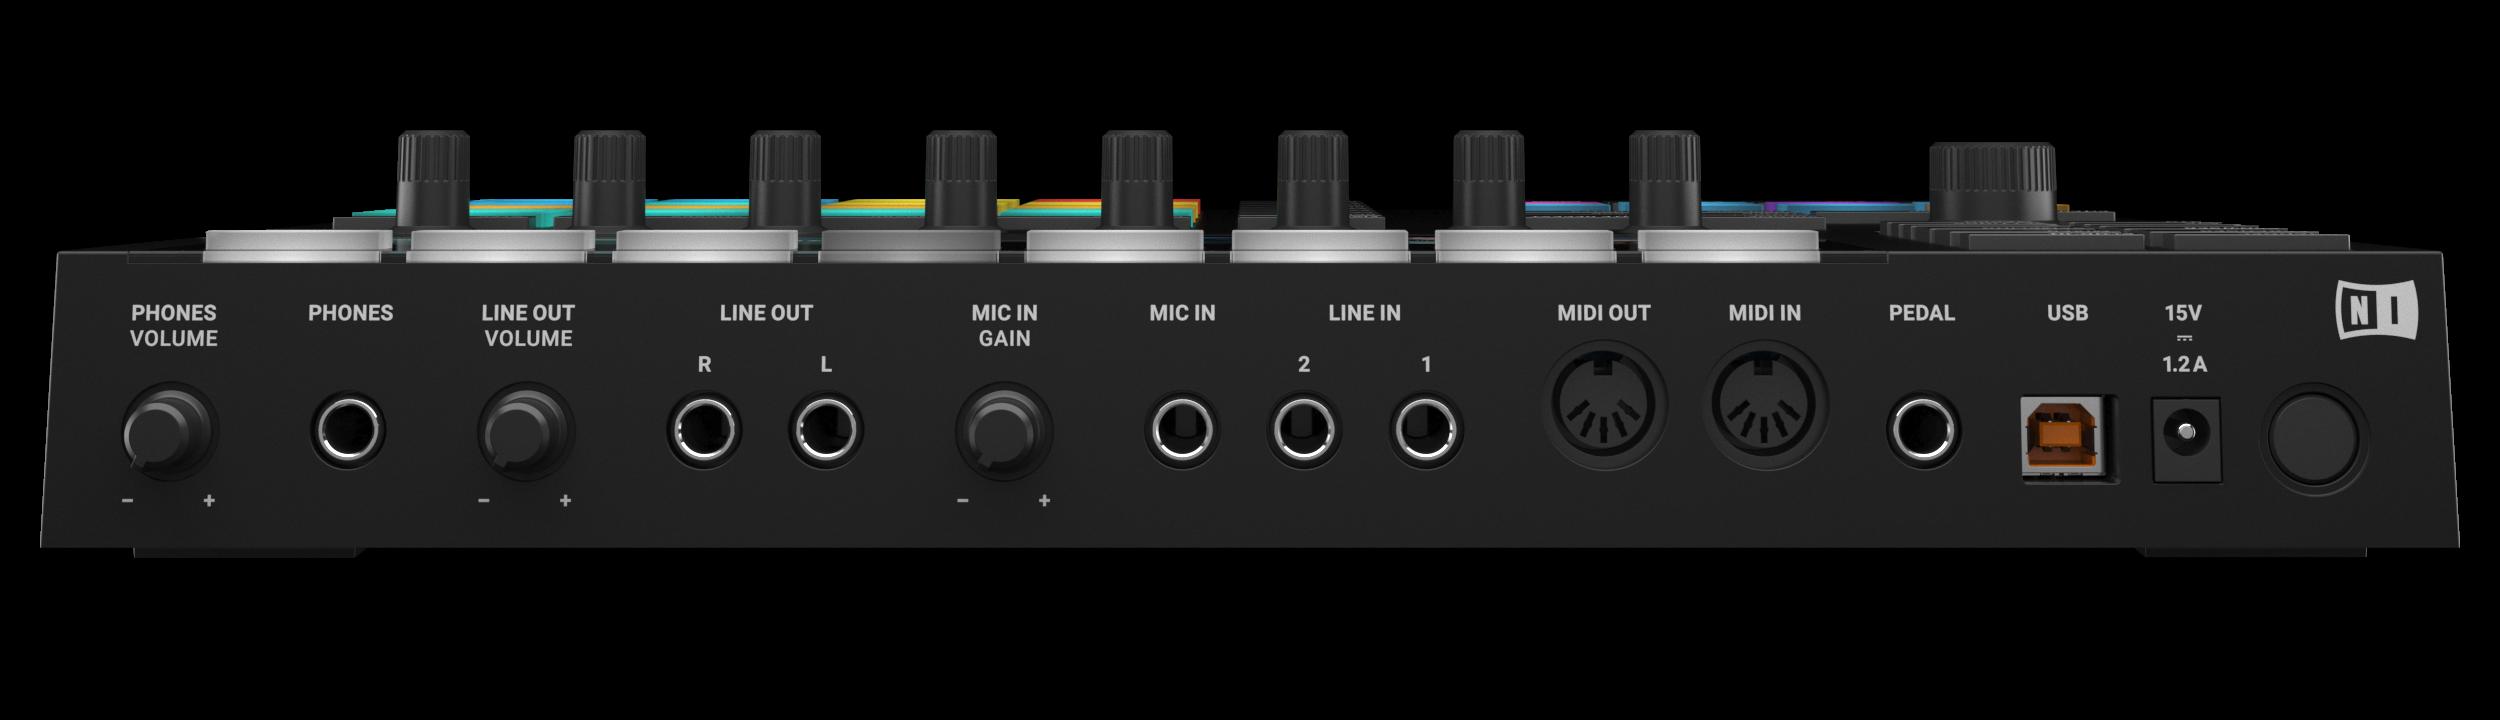 NI Maschine Mk3, Akai MPK Mini Mk2, 2x Eris E5 | Bop DJ